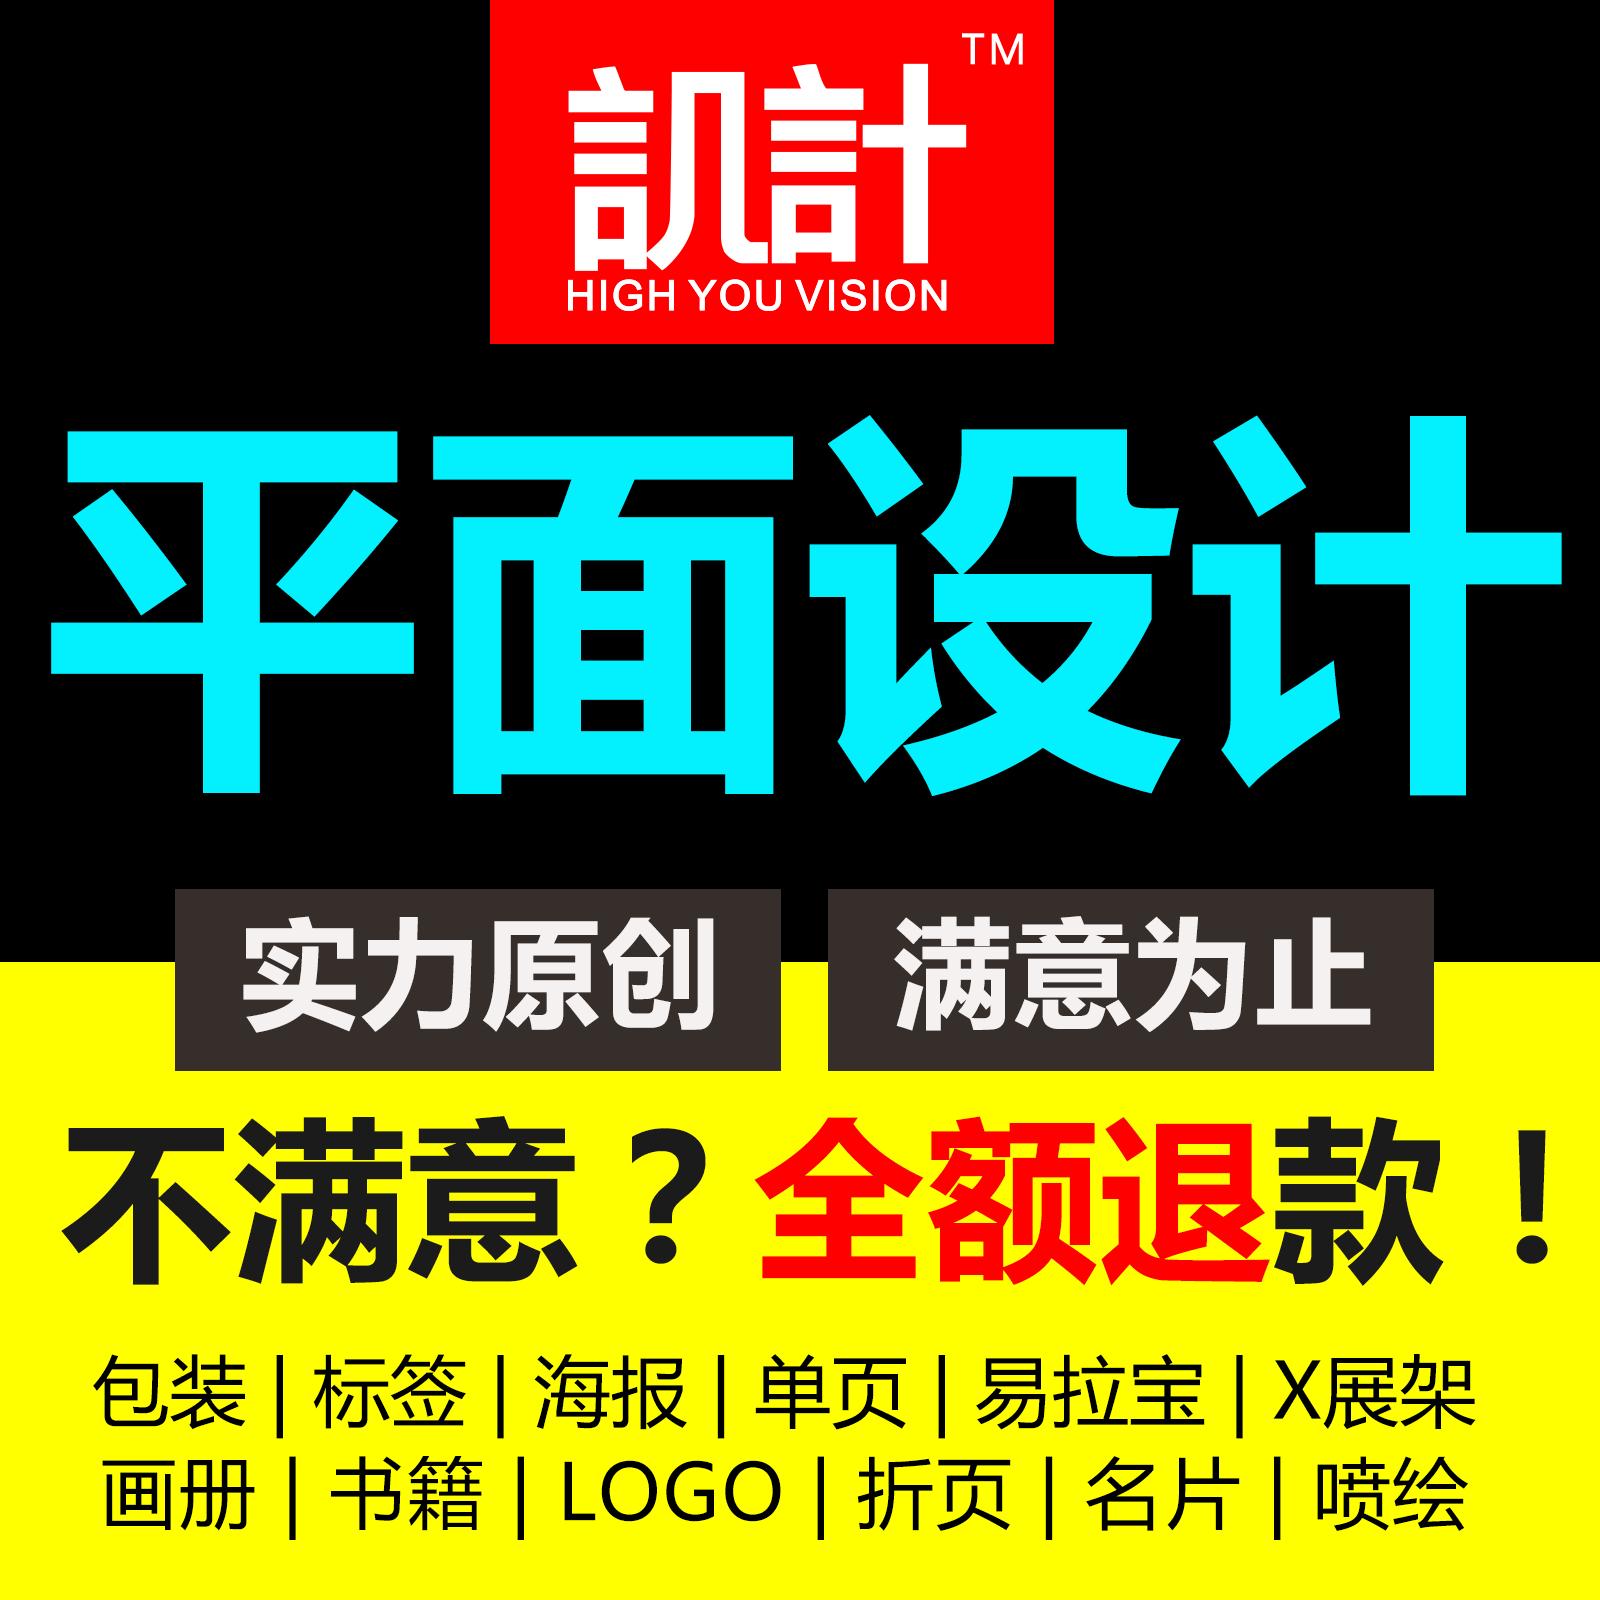 ps平面包装盒袋宣传单册广告logo彩页画册喷绘排版易拉宝海报设计